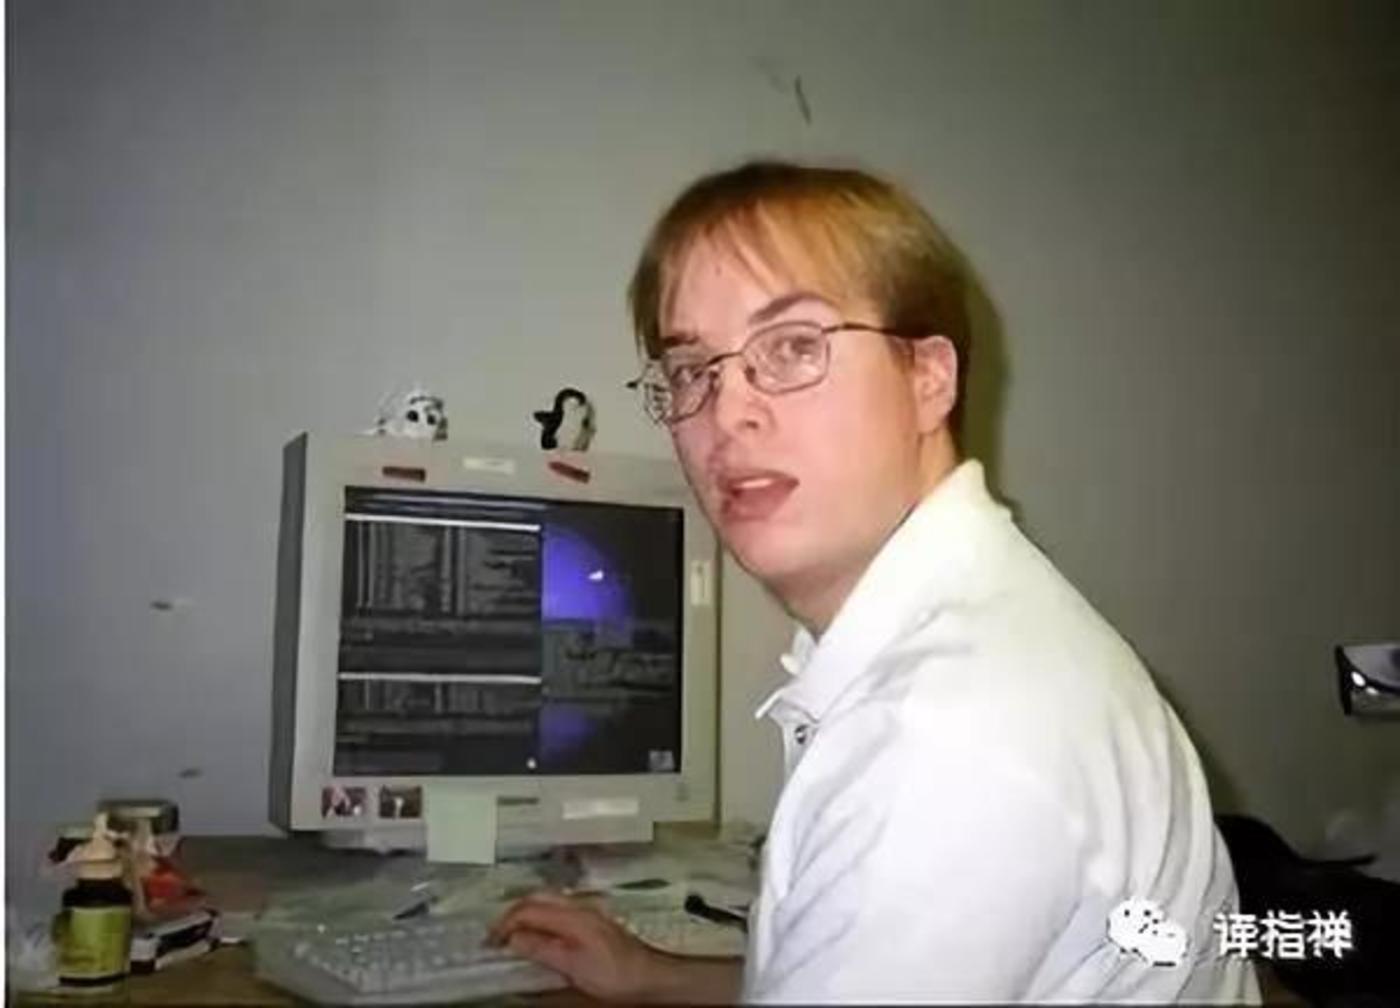 Gmail创始人保罗·布克海特在谷歌办公桌前,摄于1999年(摄影:Courtesy Paul Buchheit)